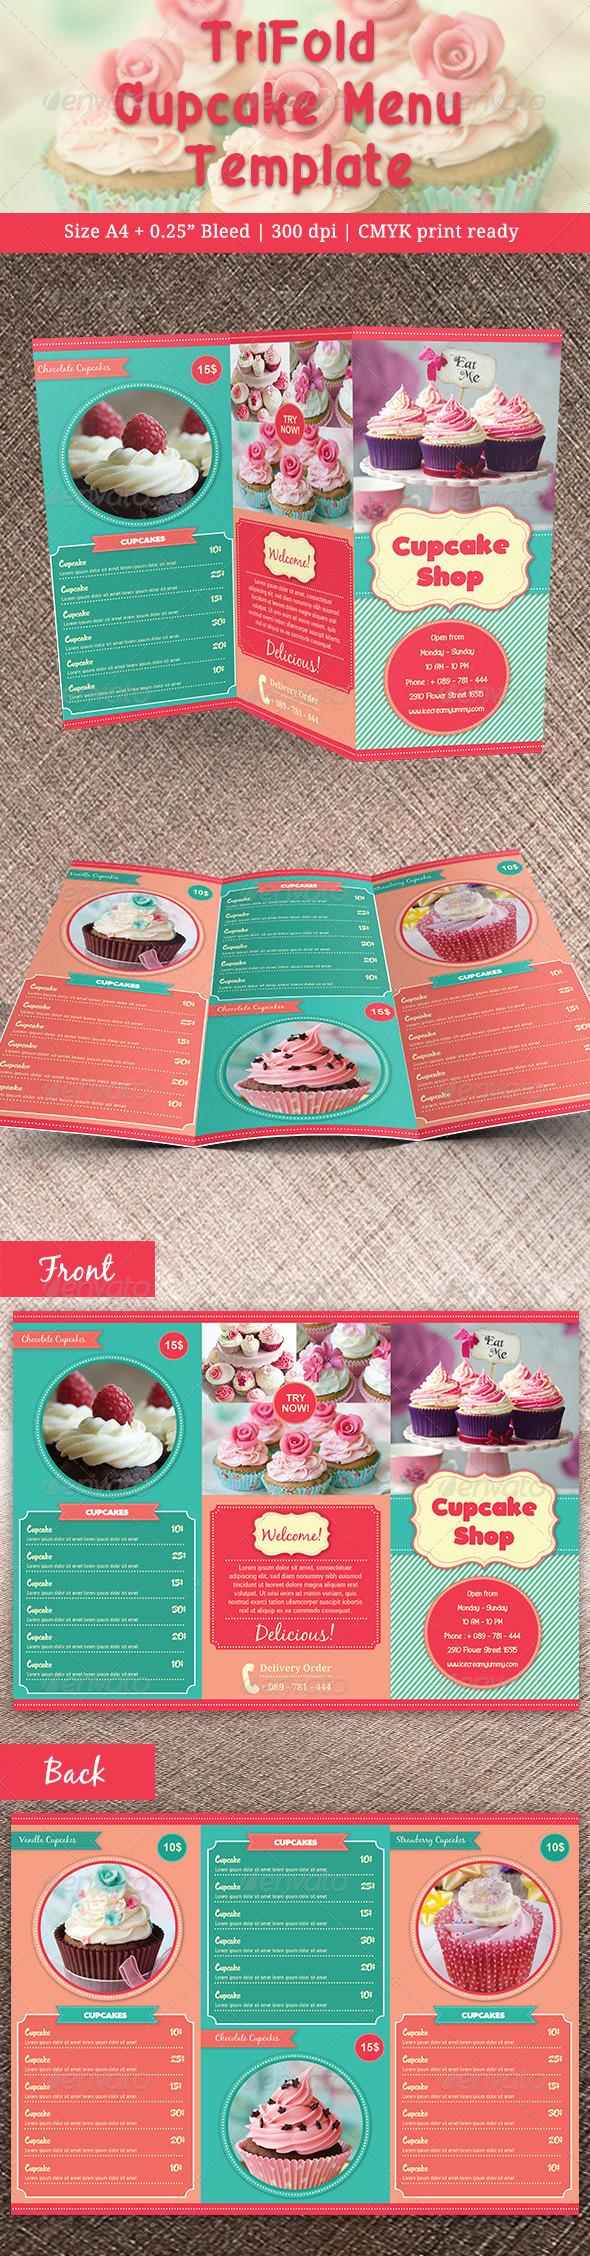 GraphicRiver TriFold Cupcakes Menu 7766041